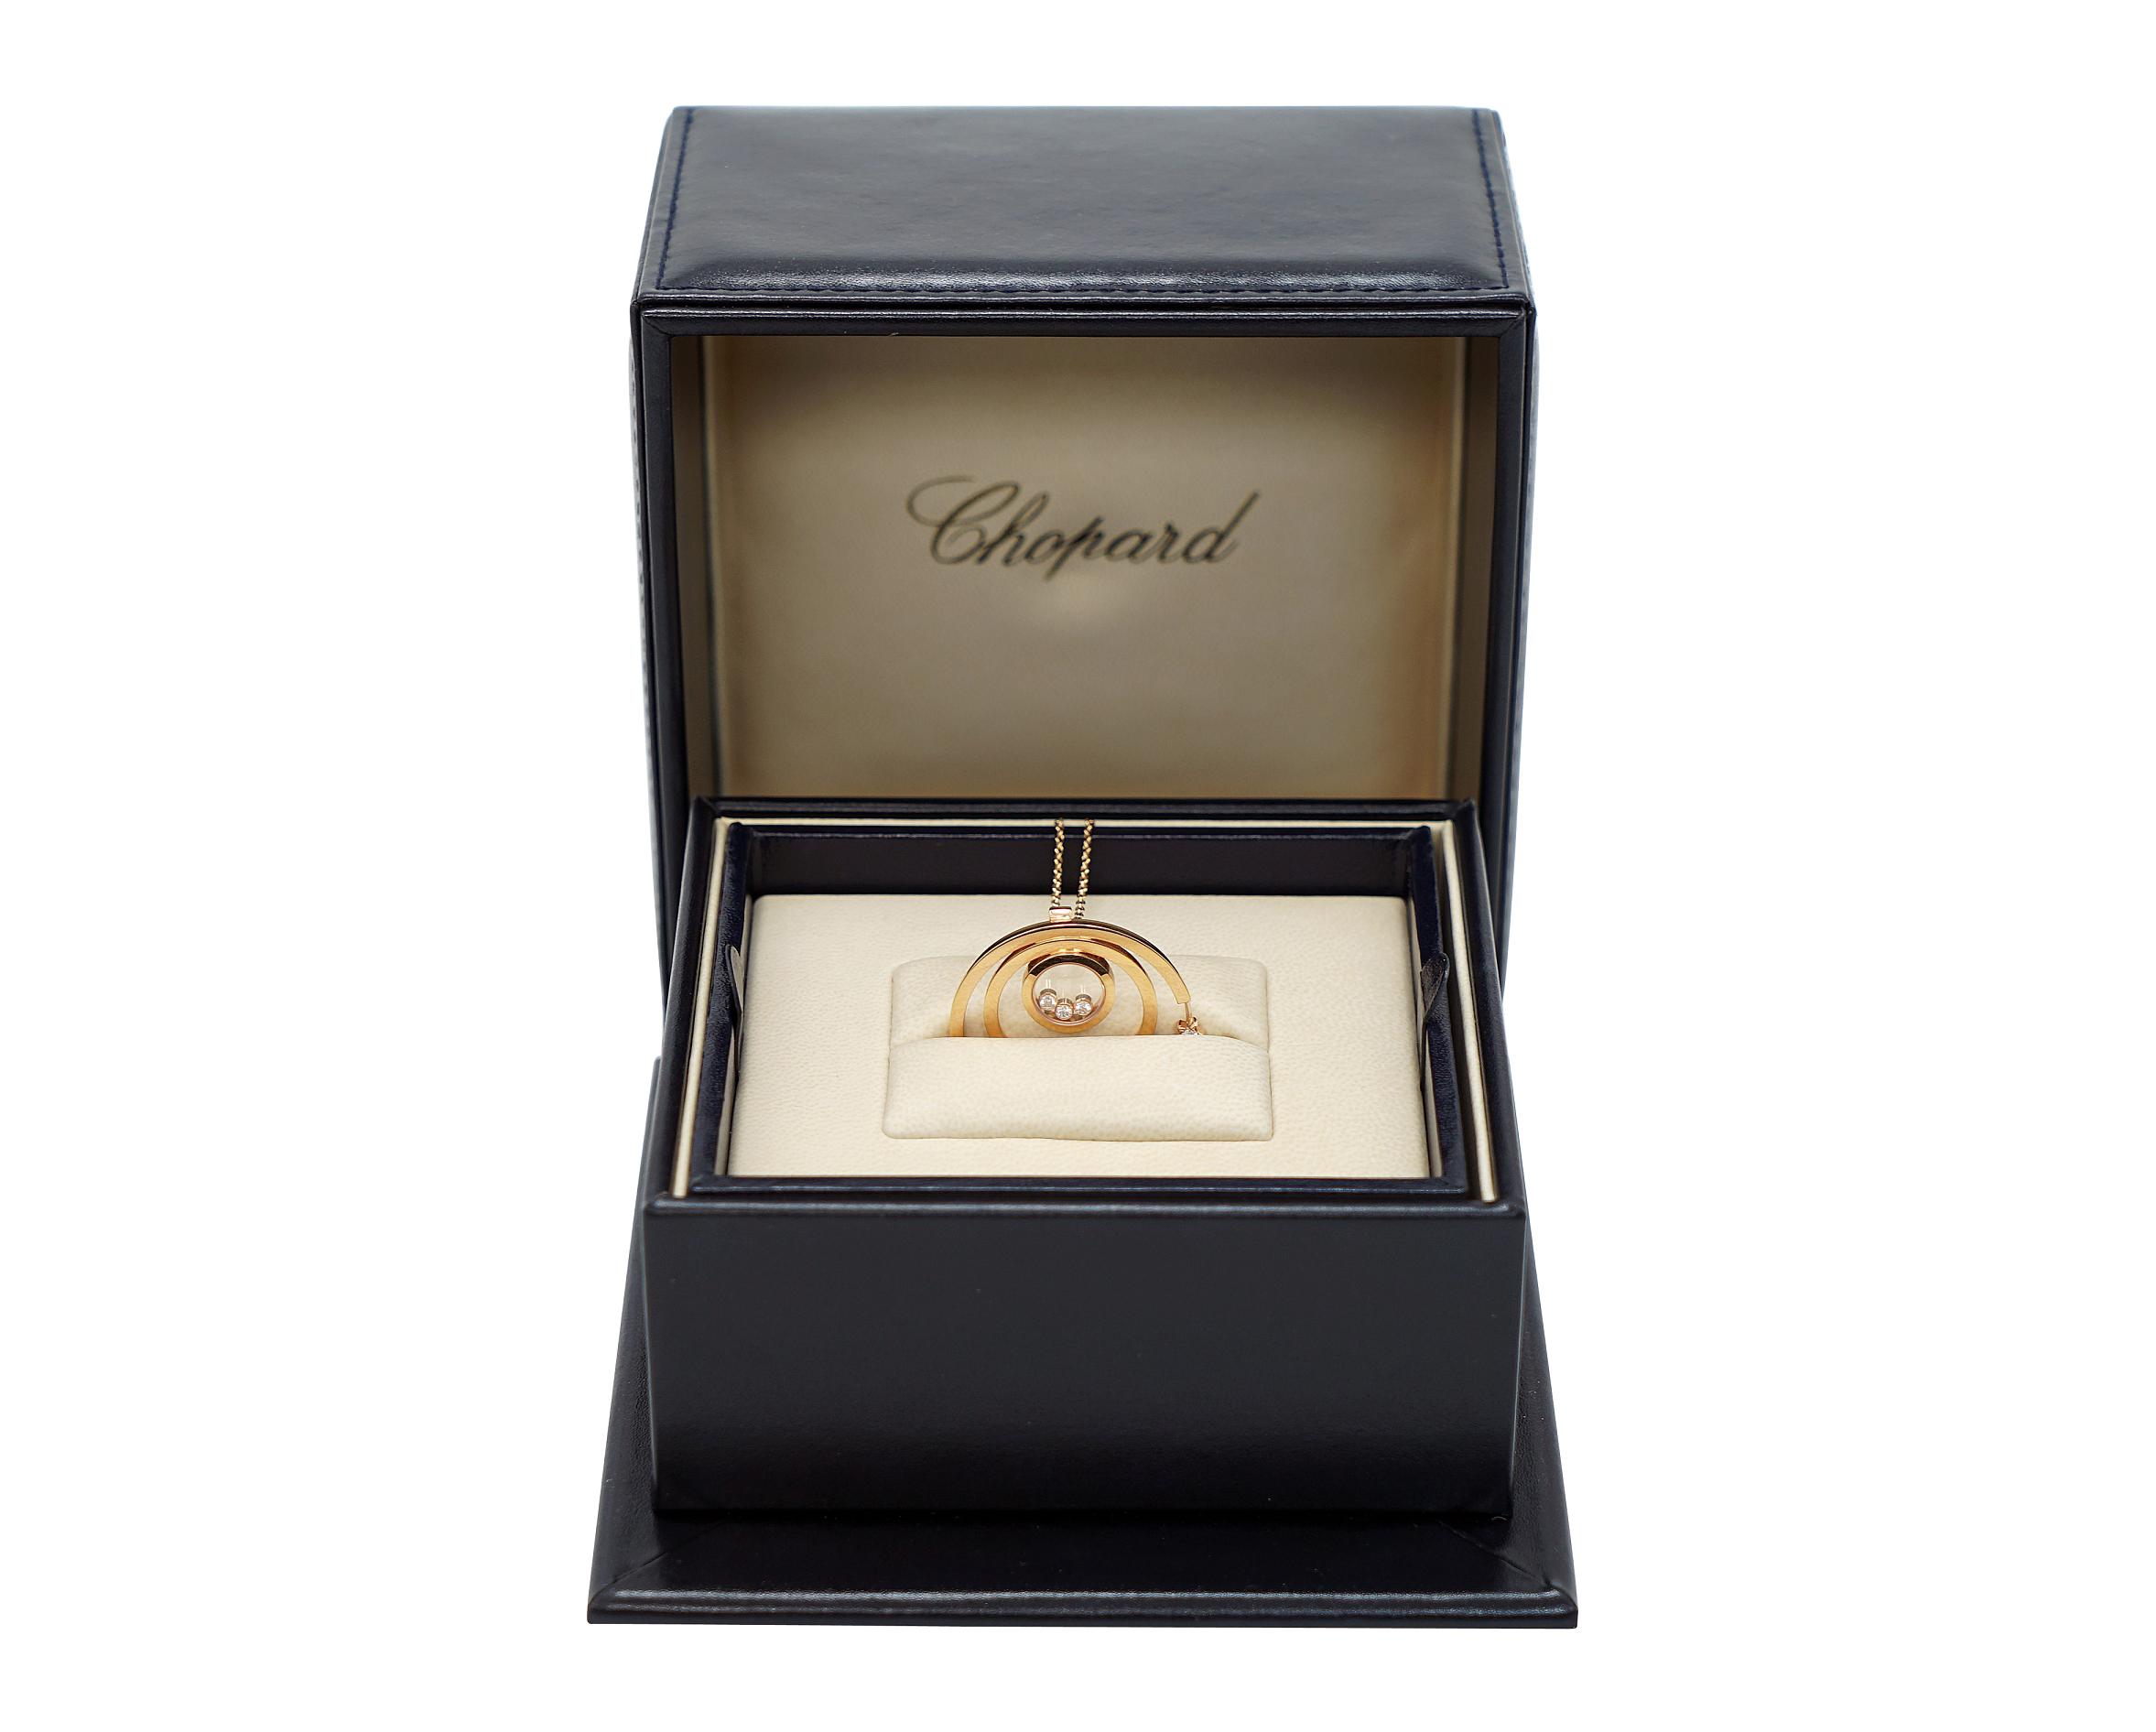 A Lady's Chopard 18K Rose Gold , Happy Diamonds pendant